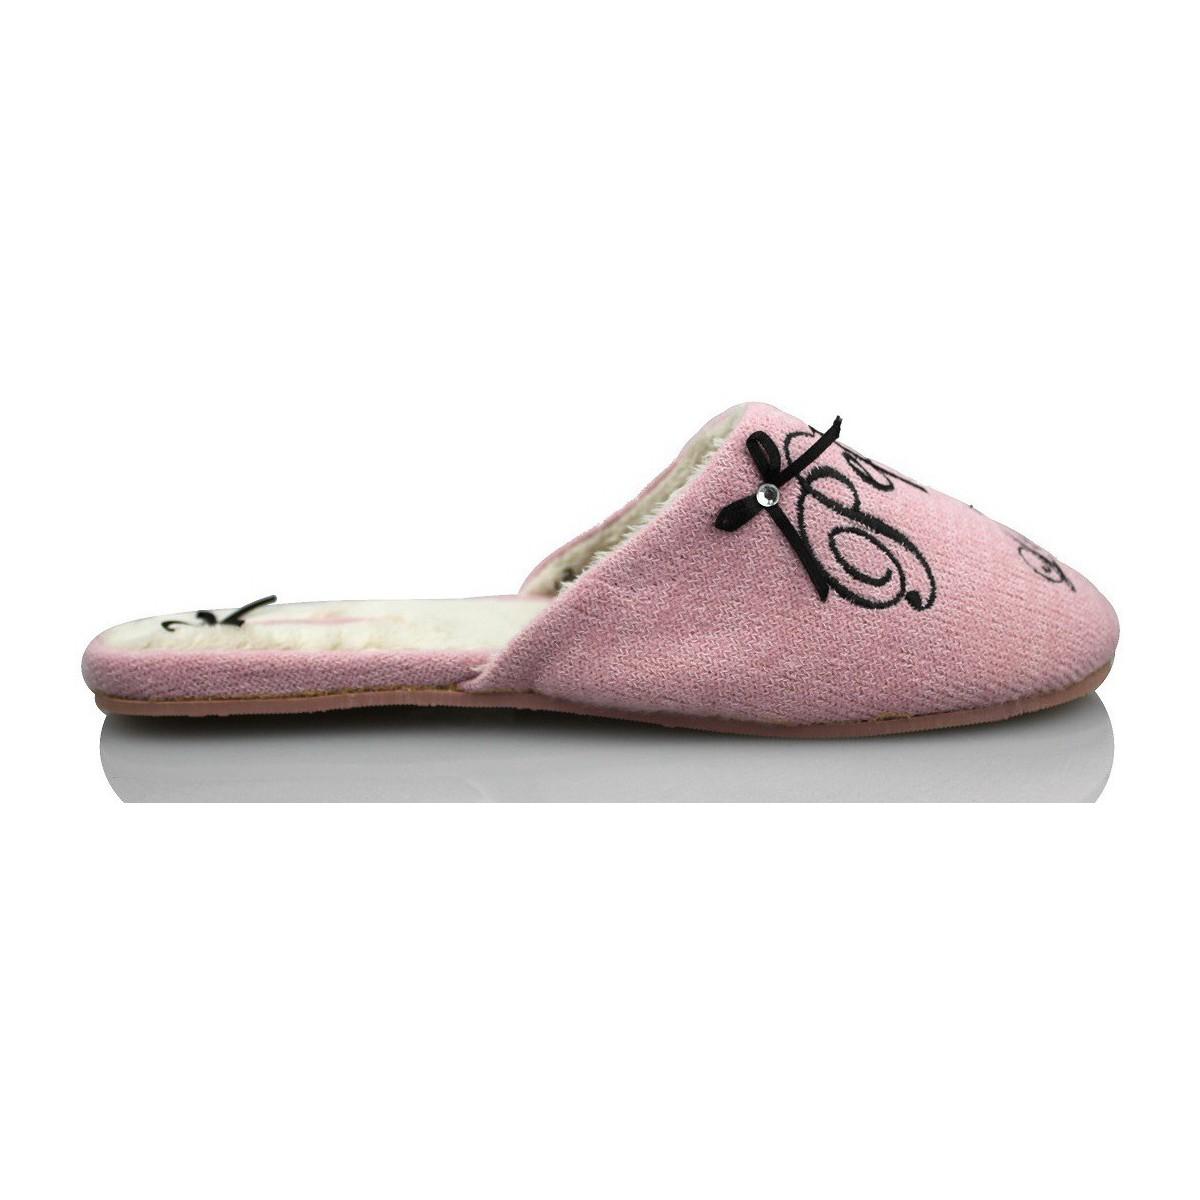 Pepe jeans Schuhe Inlands Frau PINK - Schuhe Hausschuhe Damen 40,95 €